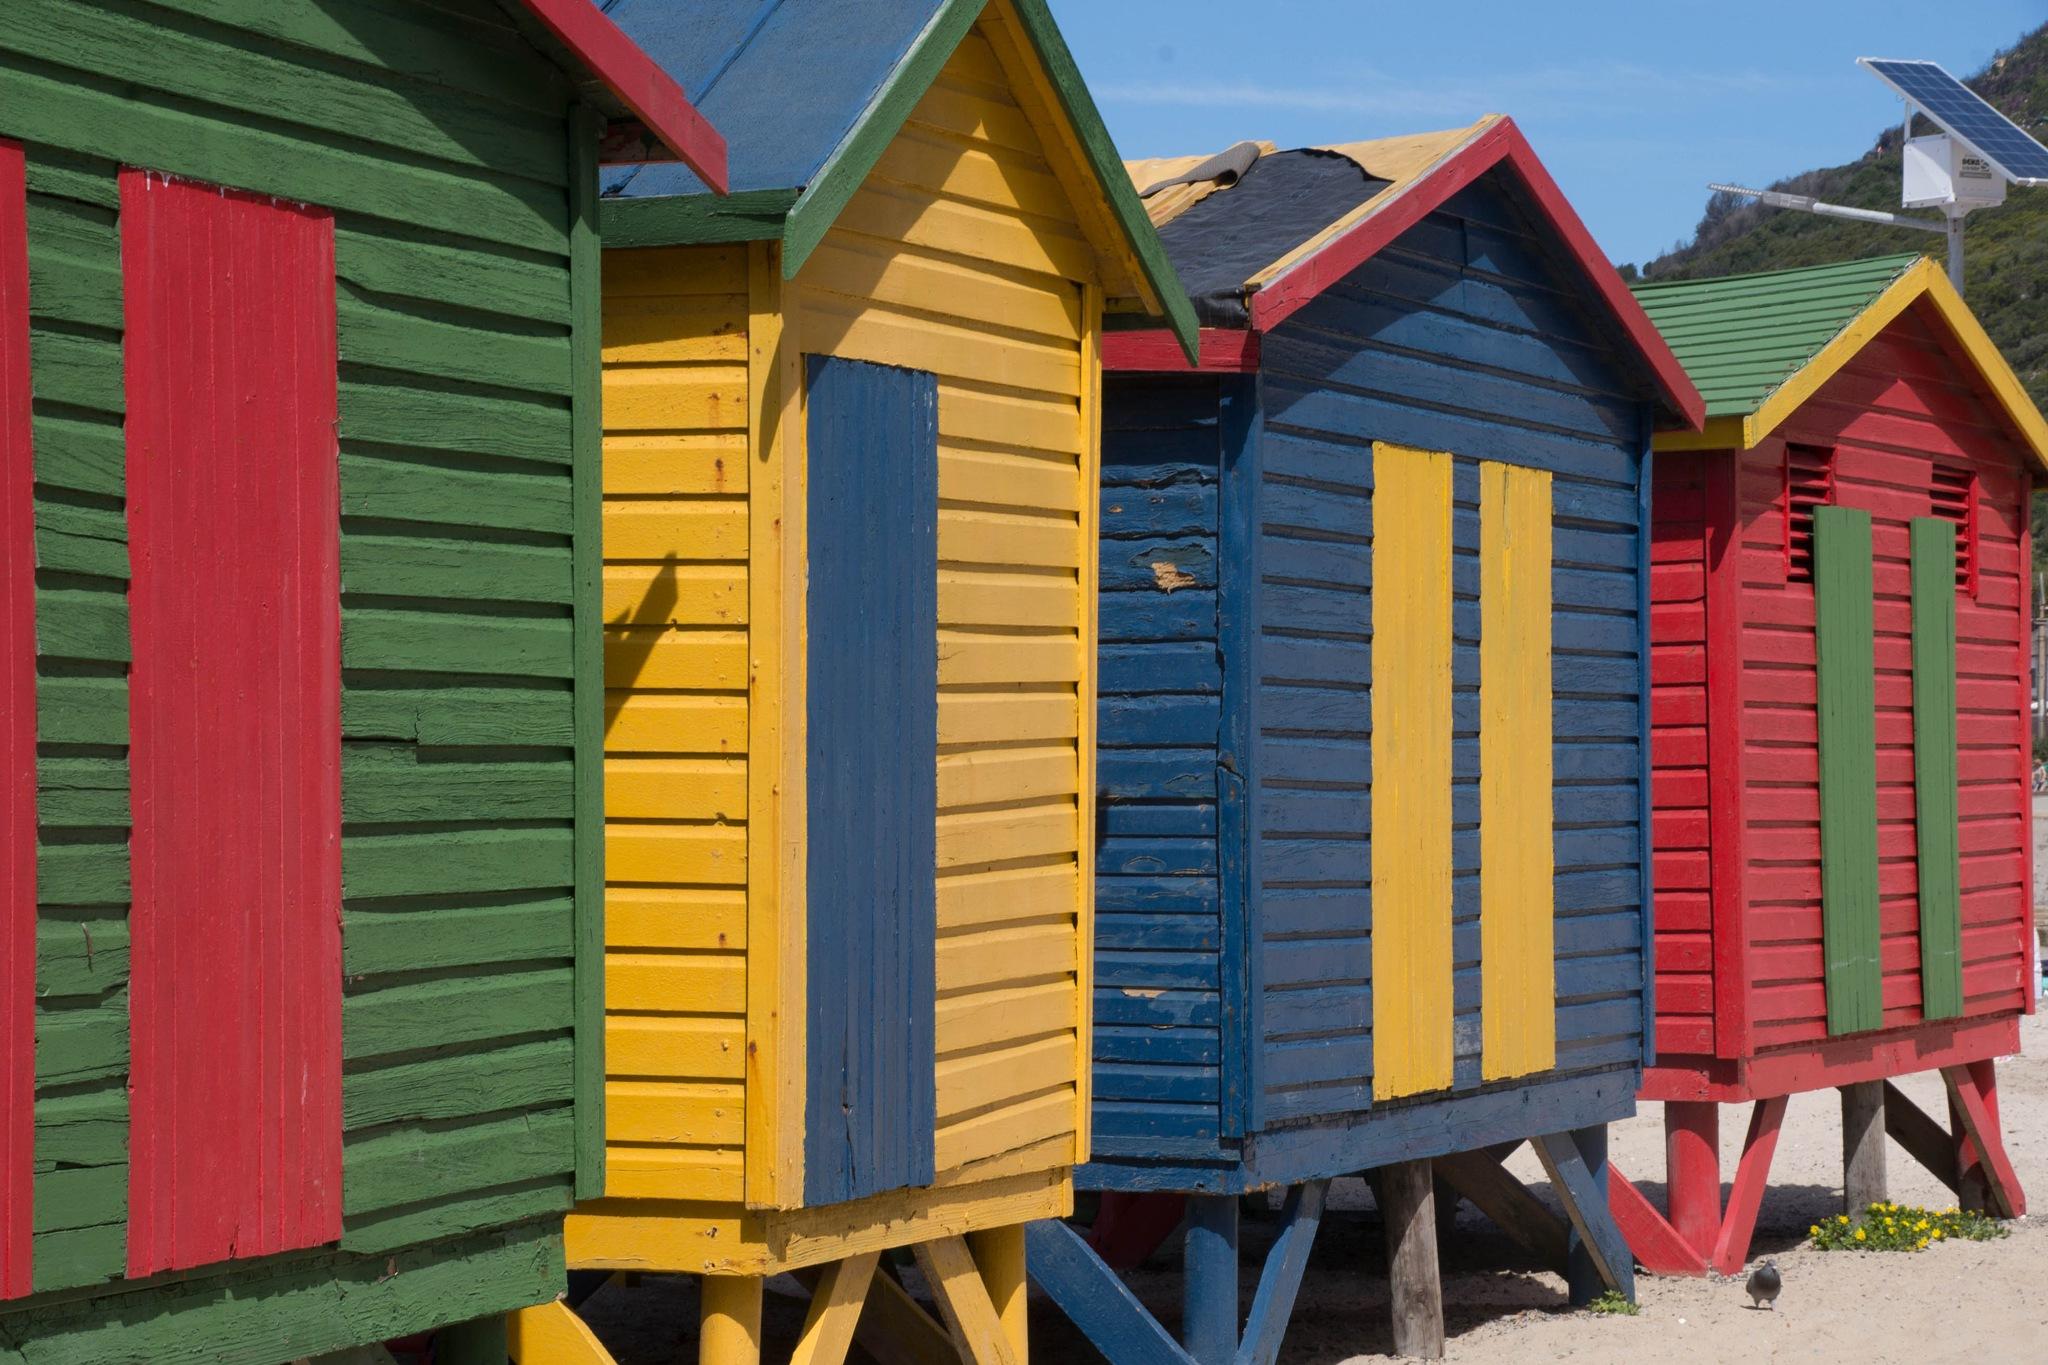 beach huts  by martin